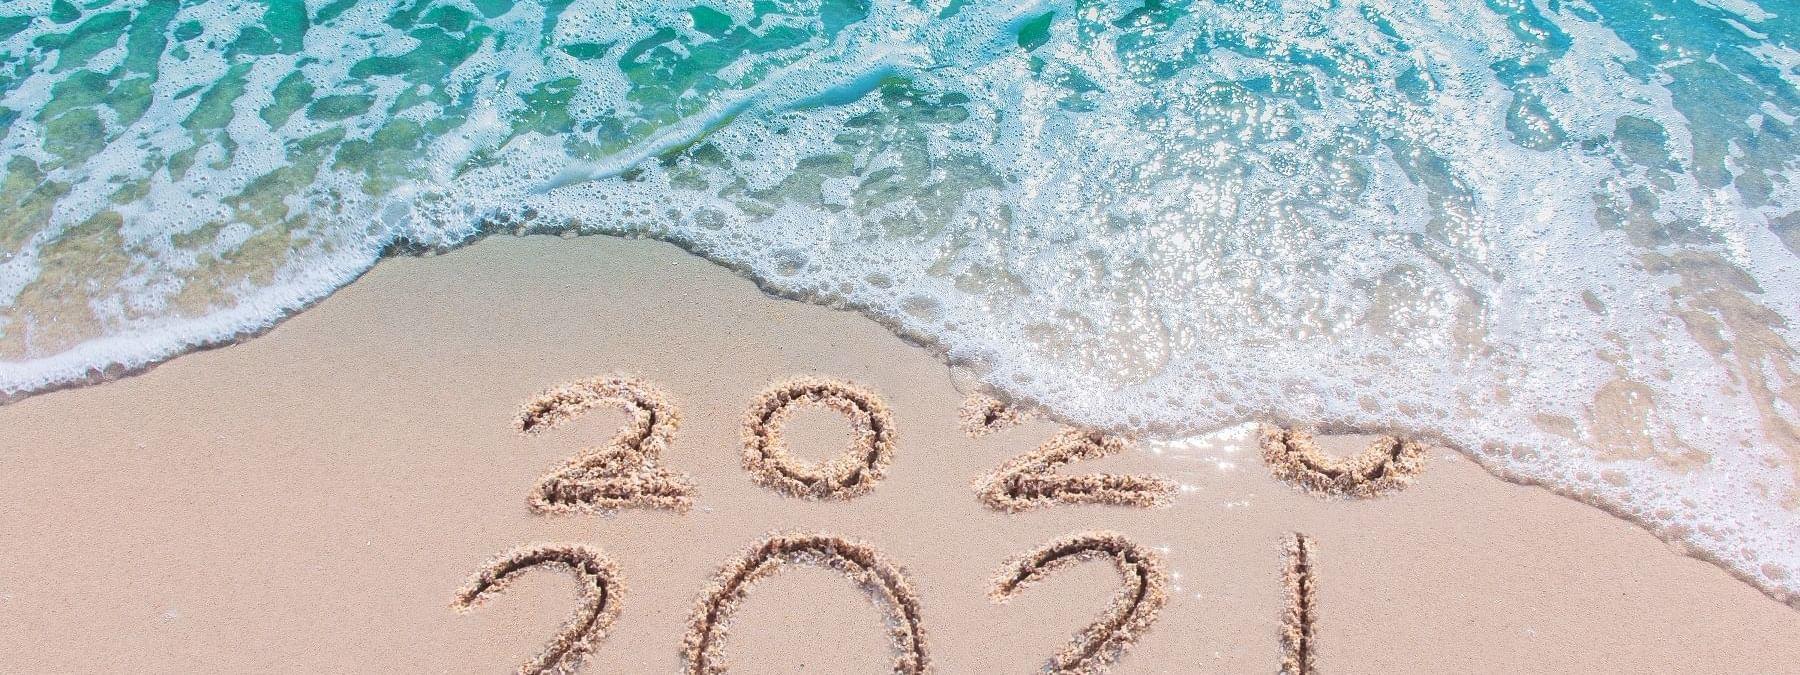 2021 written on beach at Daydream Island Resort